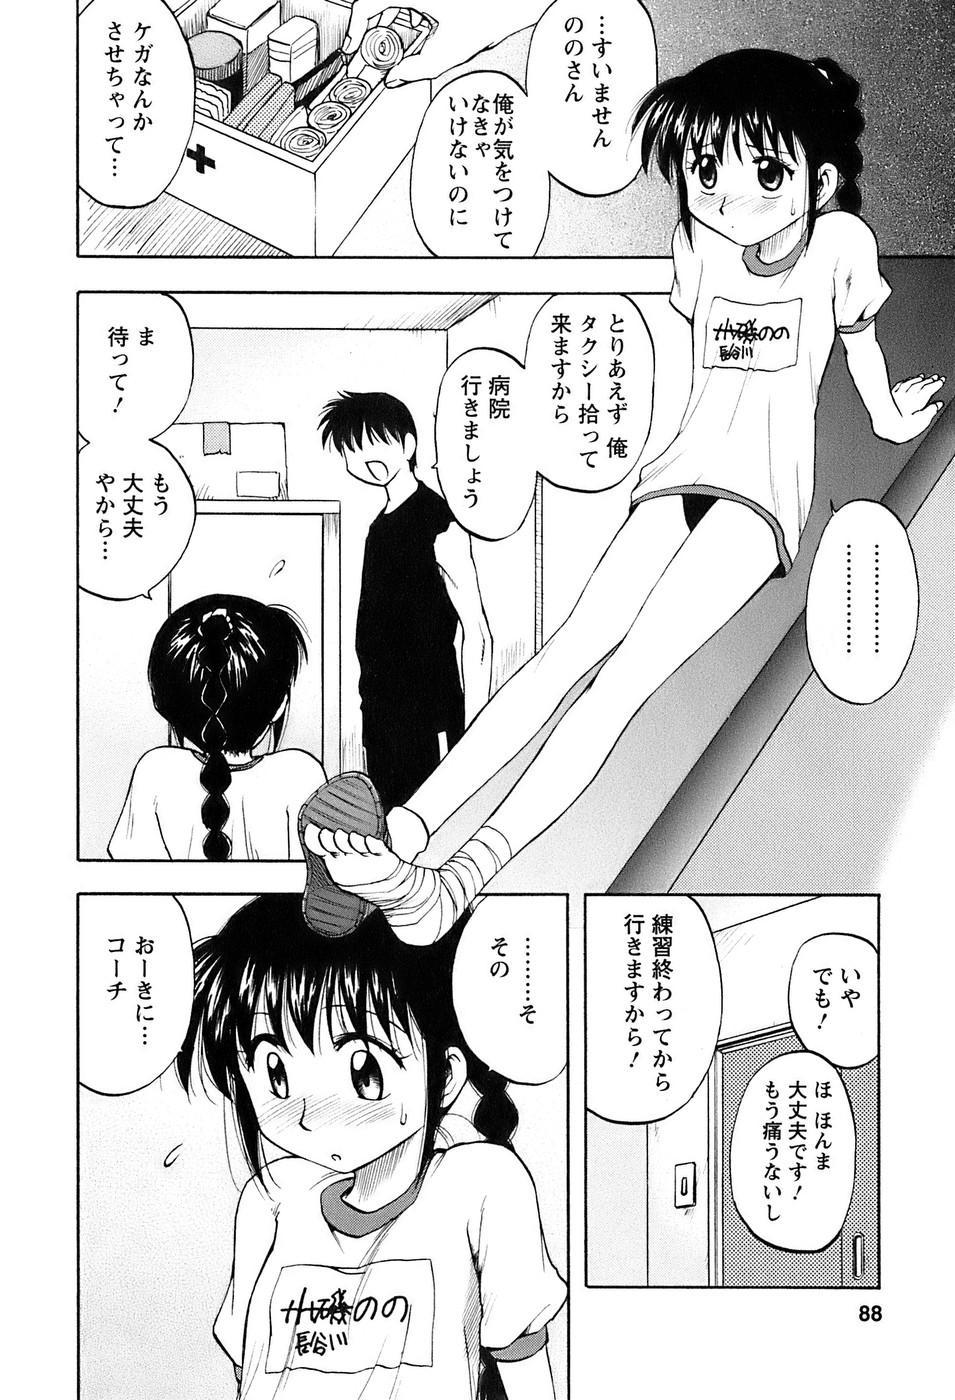 Okusan Volley - Madam Volleyball 88